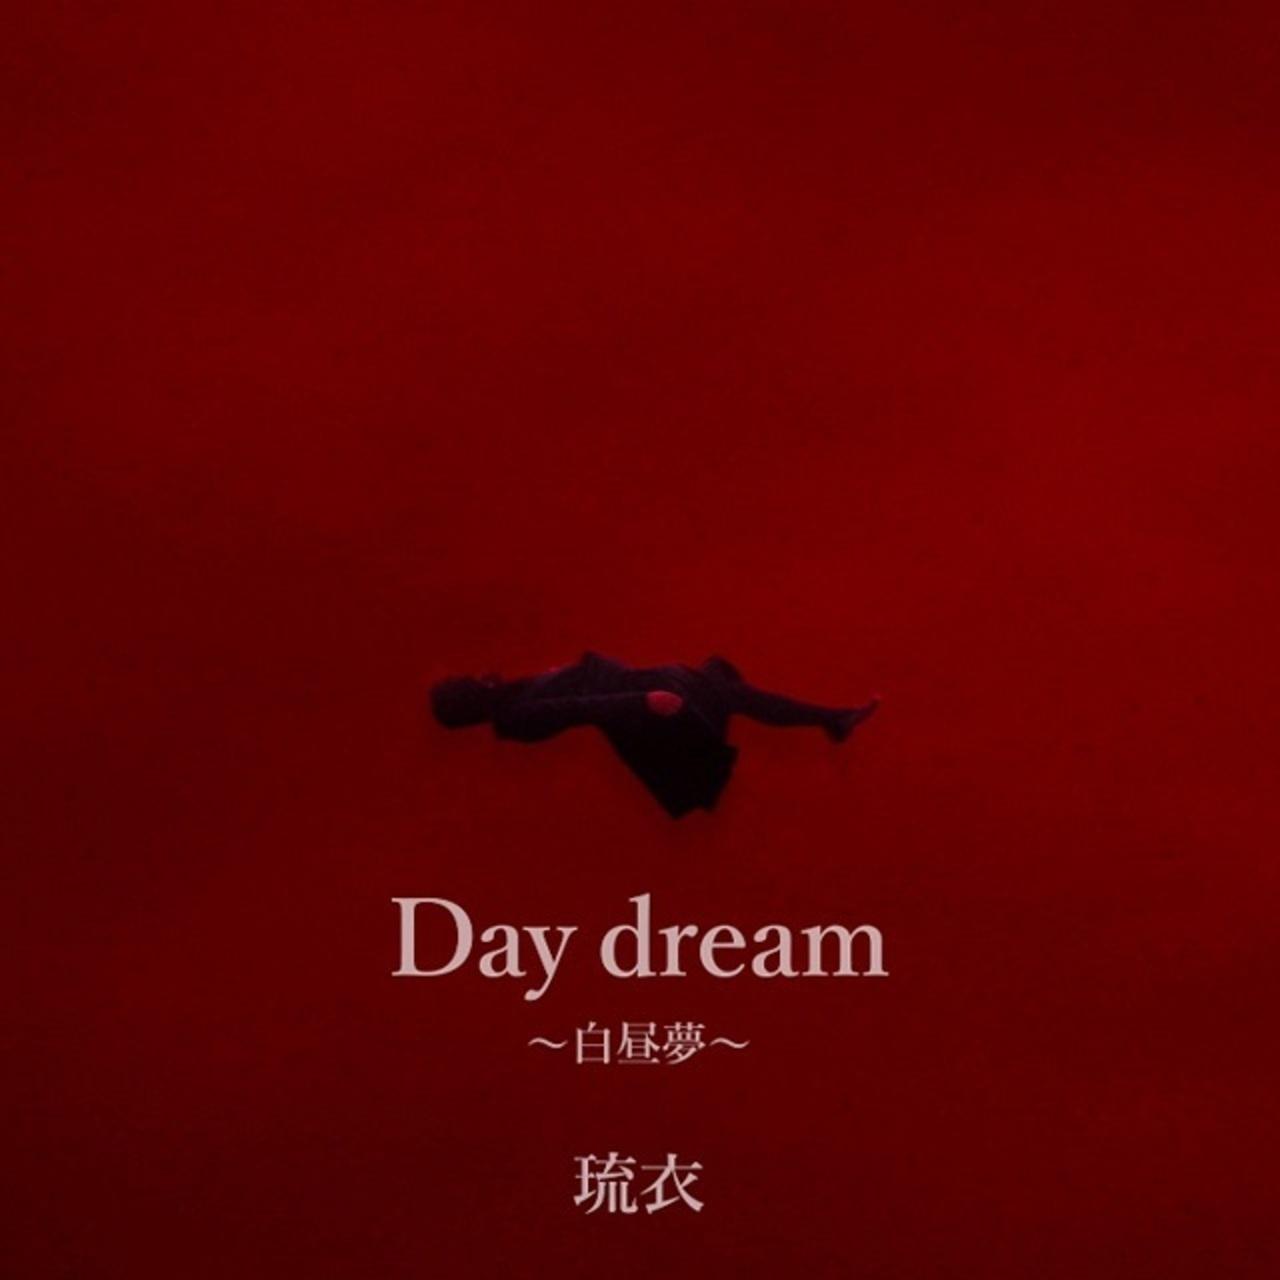 [Resim: Daydream.jpg]